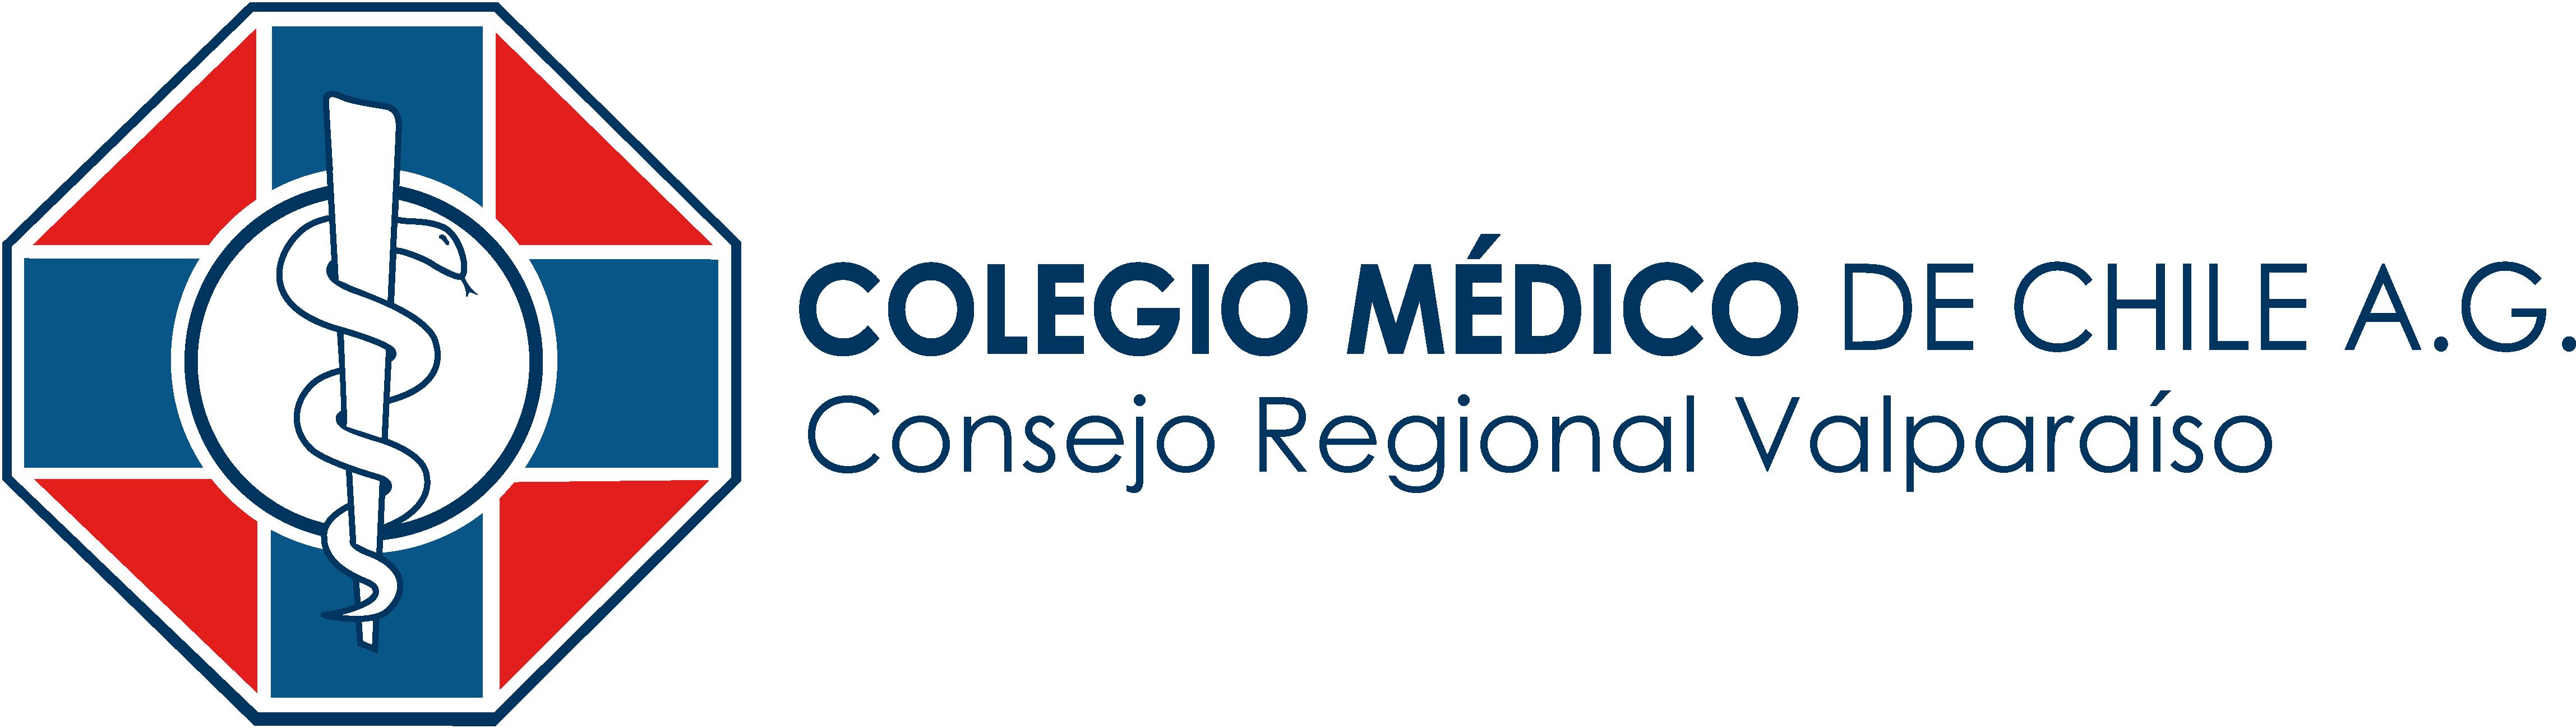 Consejo Regional Valparaíso